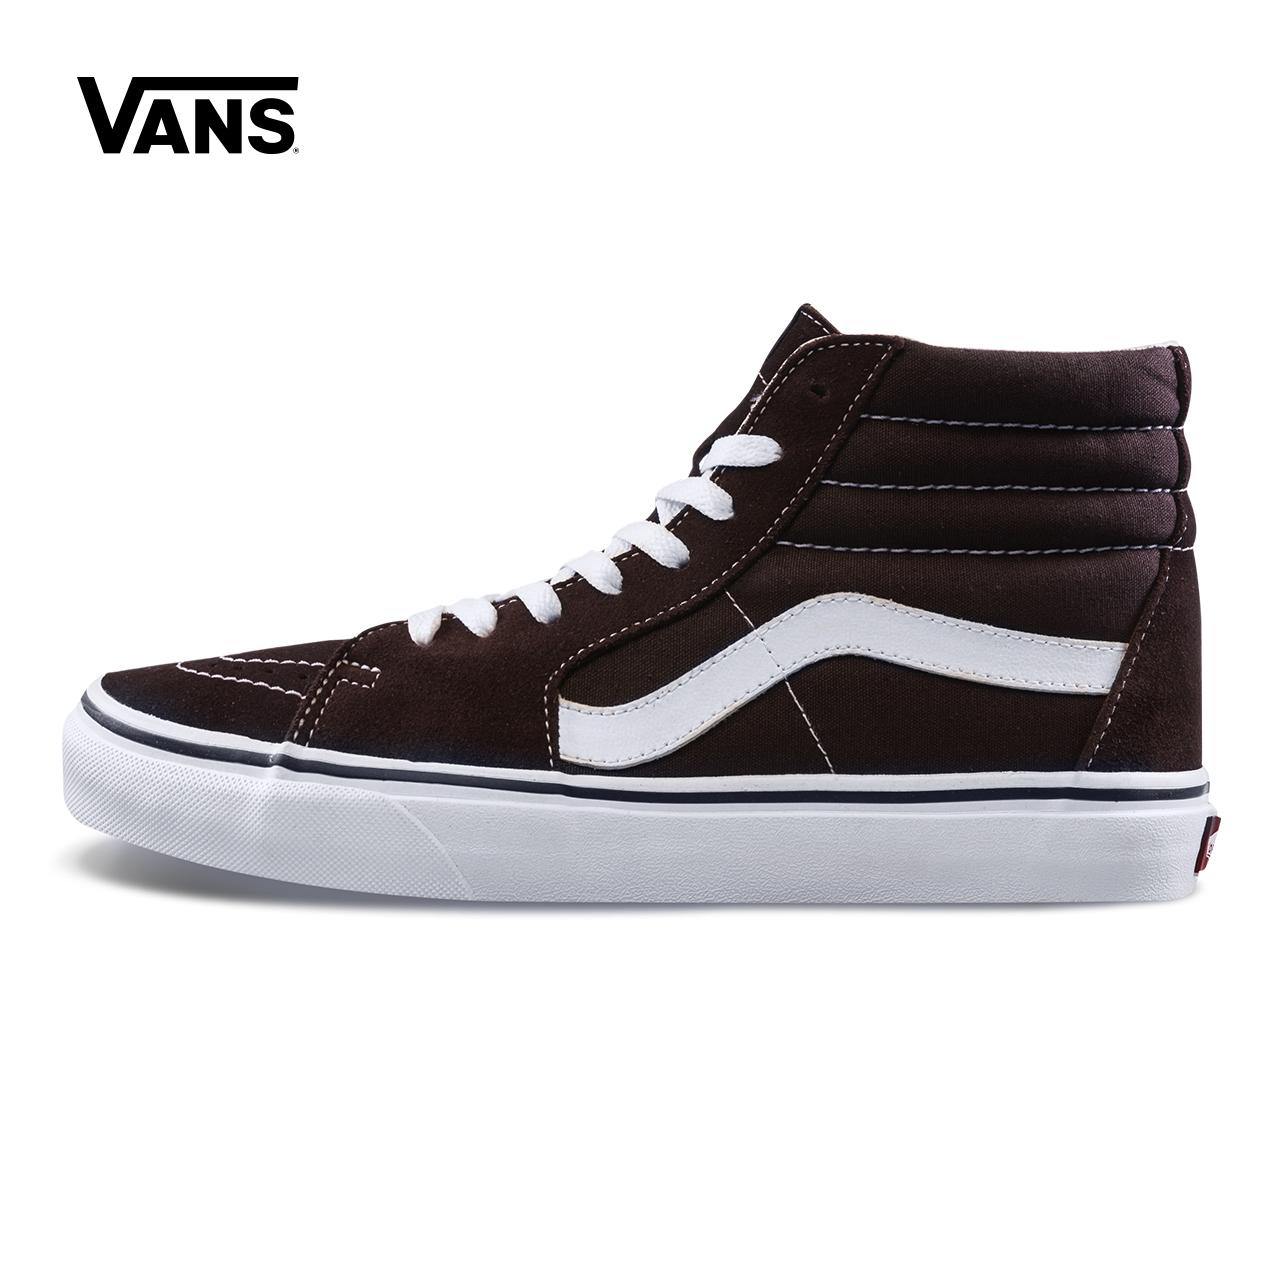 Vans 范斯官方男女款SK8-HI板鞋|VN0A38GEU5Z